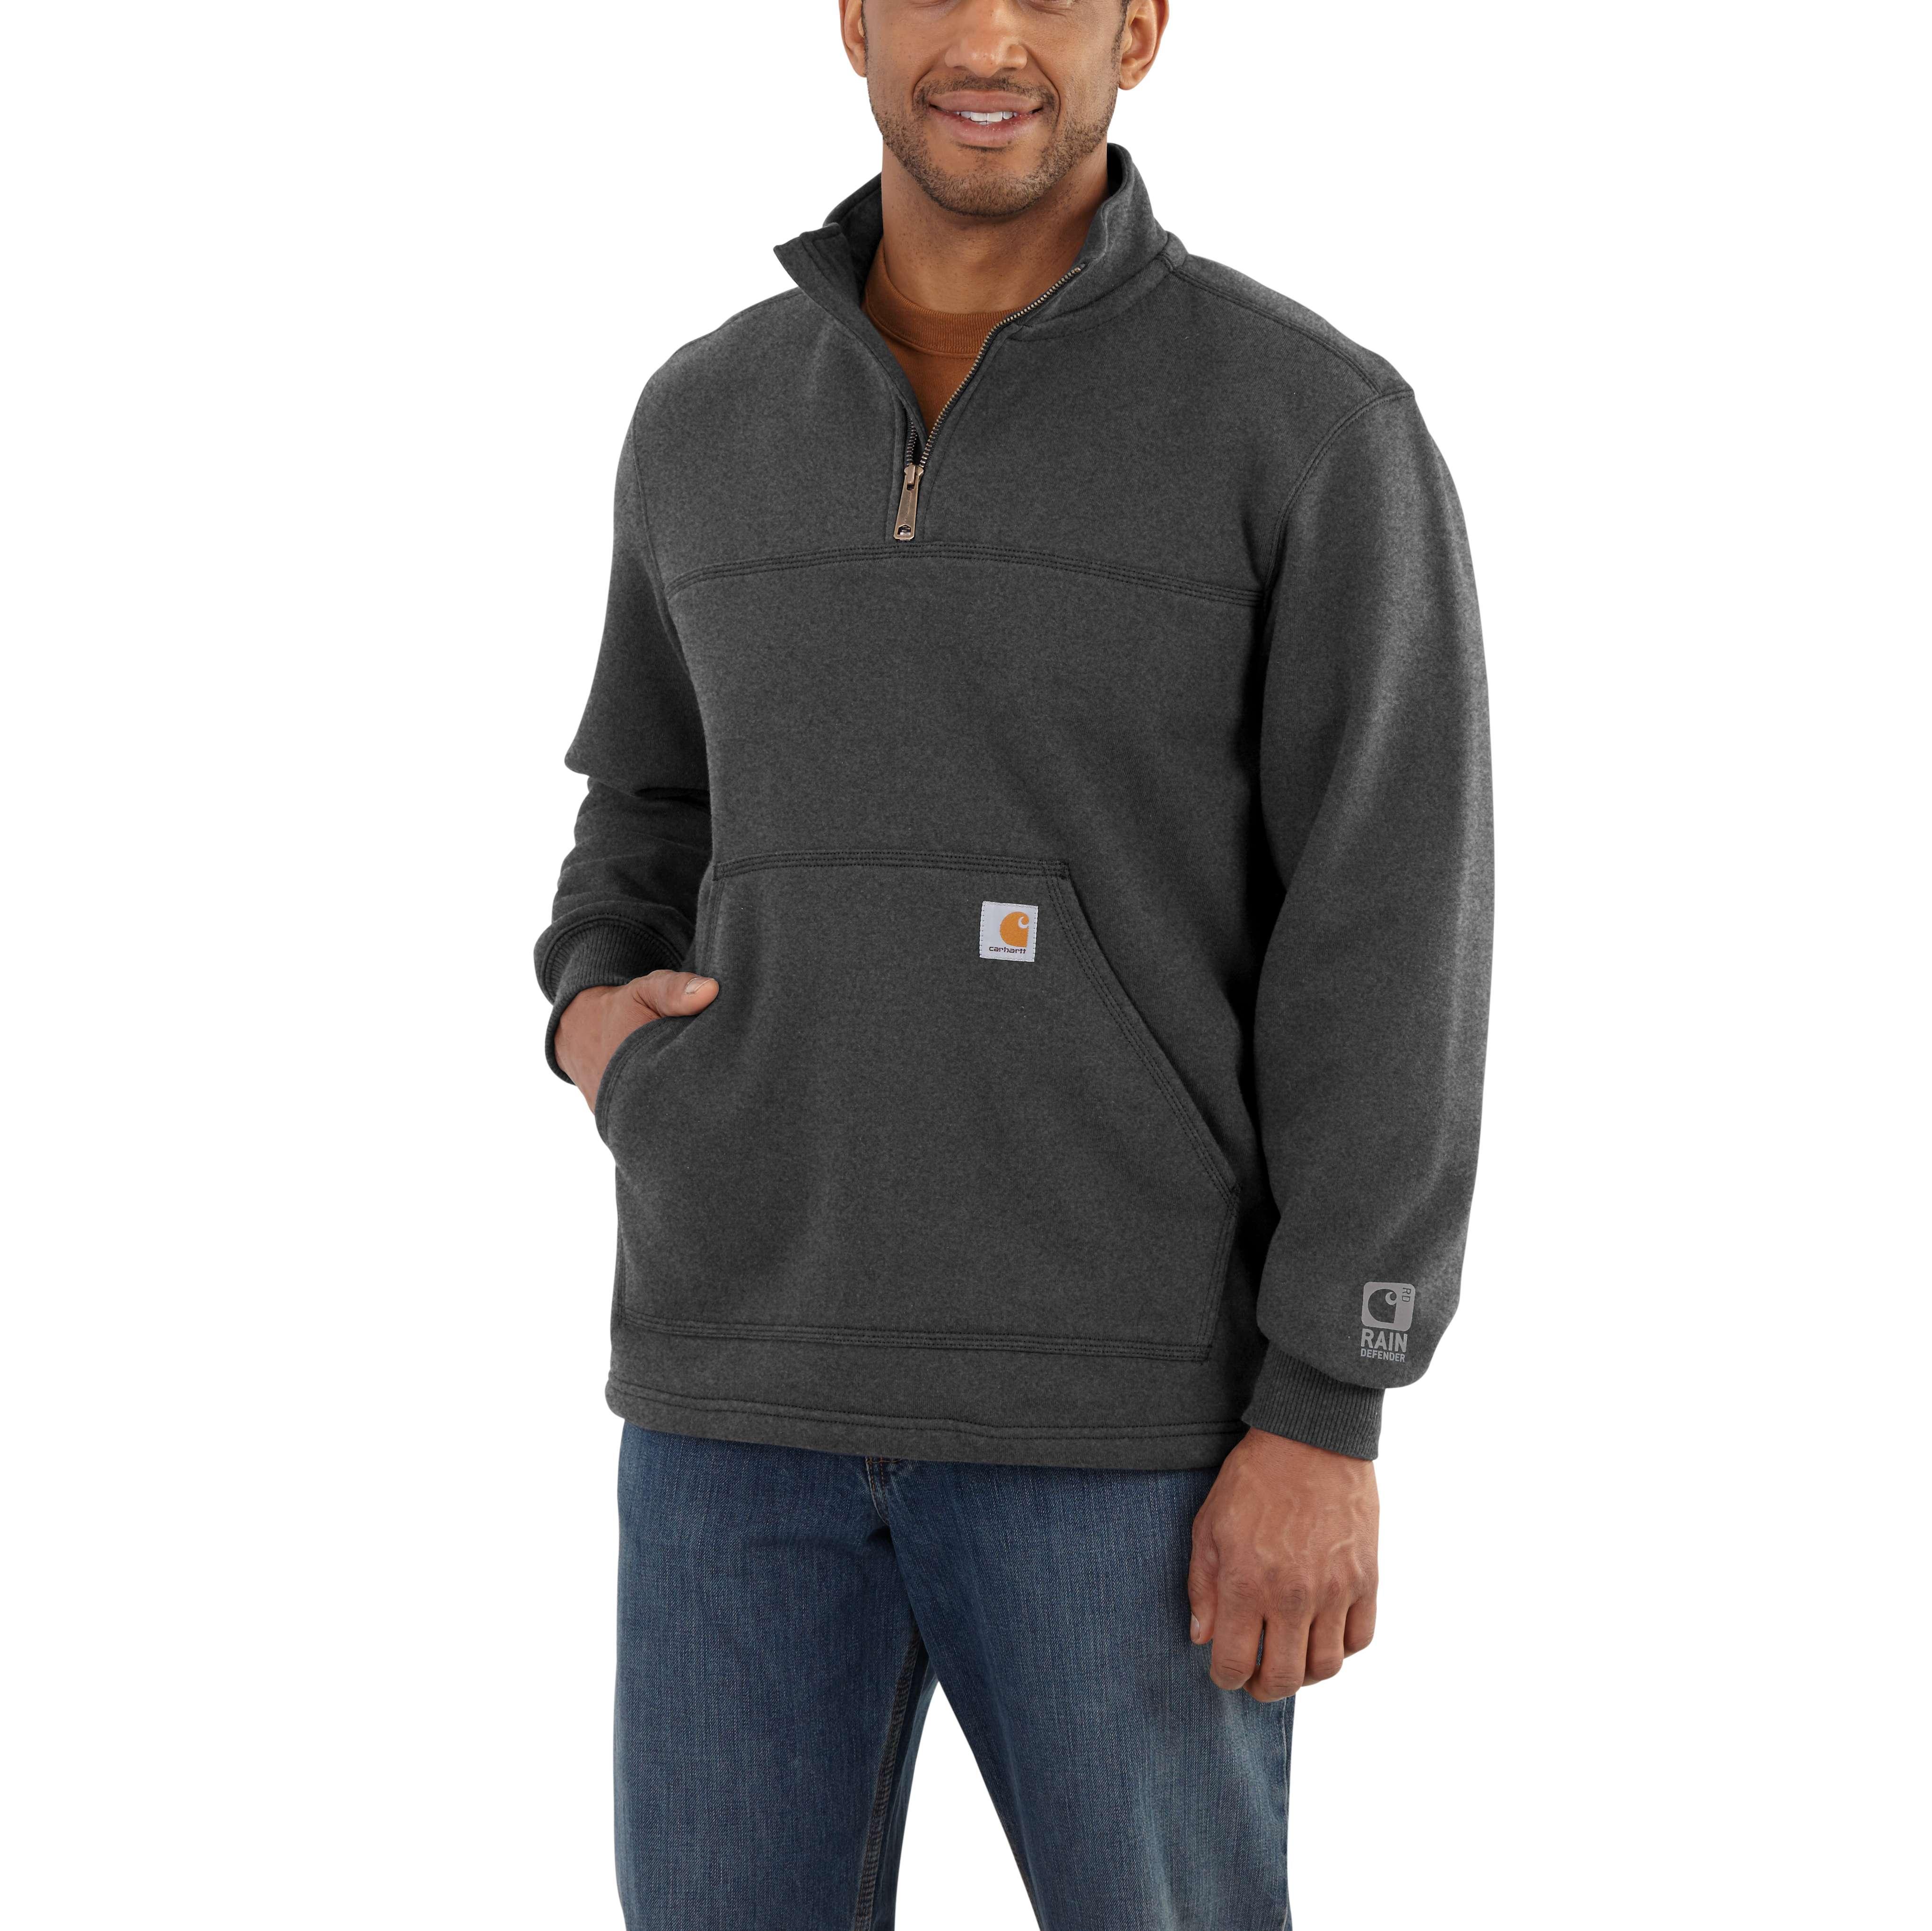 Carhartt Rain Defender Paxton Heavyweight Quarter-Zip Sweatshirt